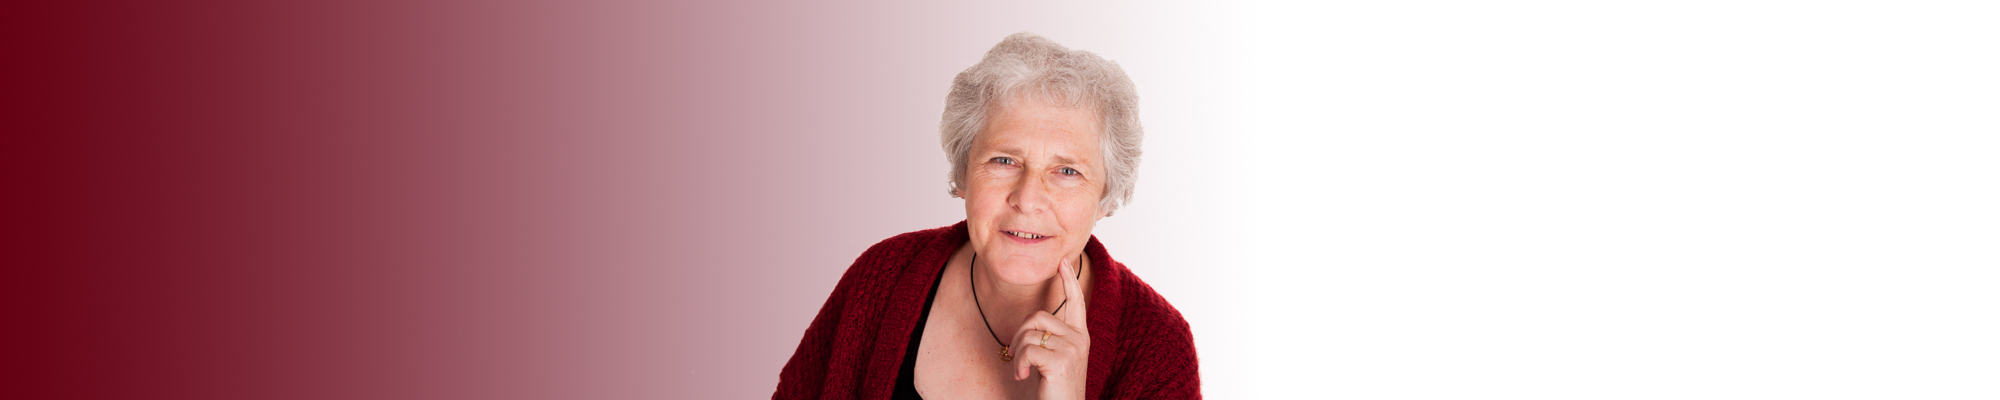 Individuele begeleiding - Lemniscaat Counselling biedt hulp.